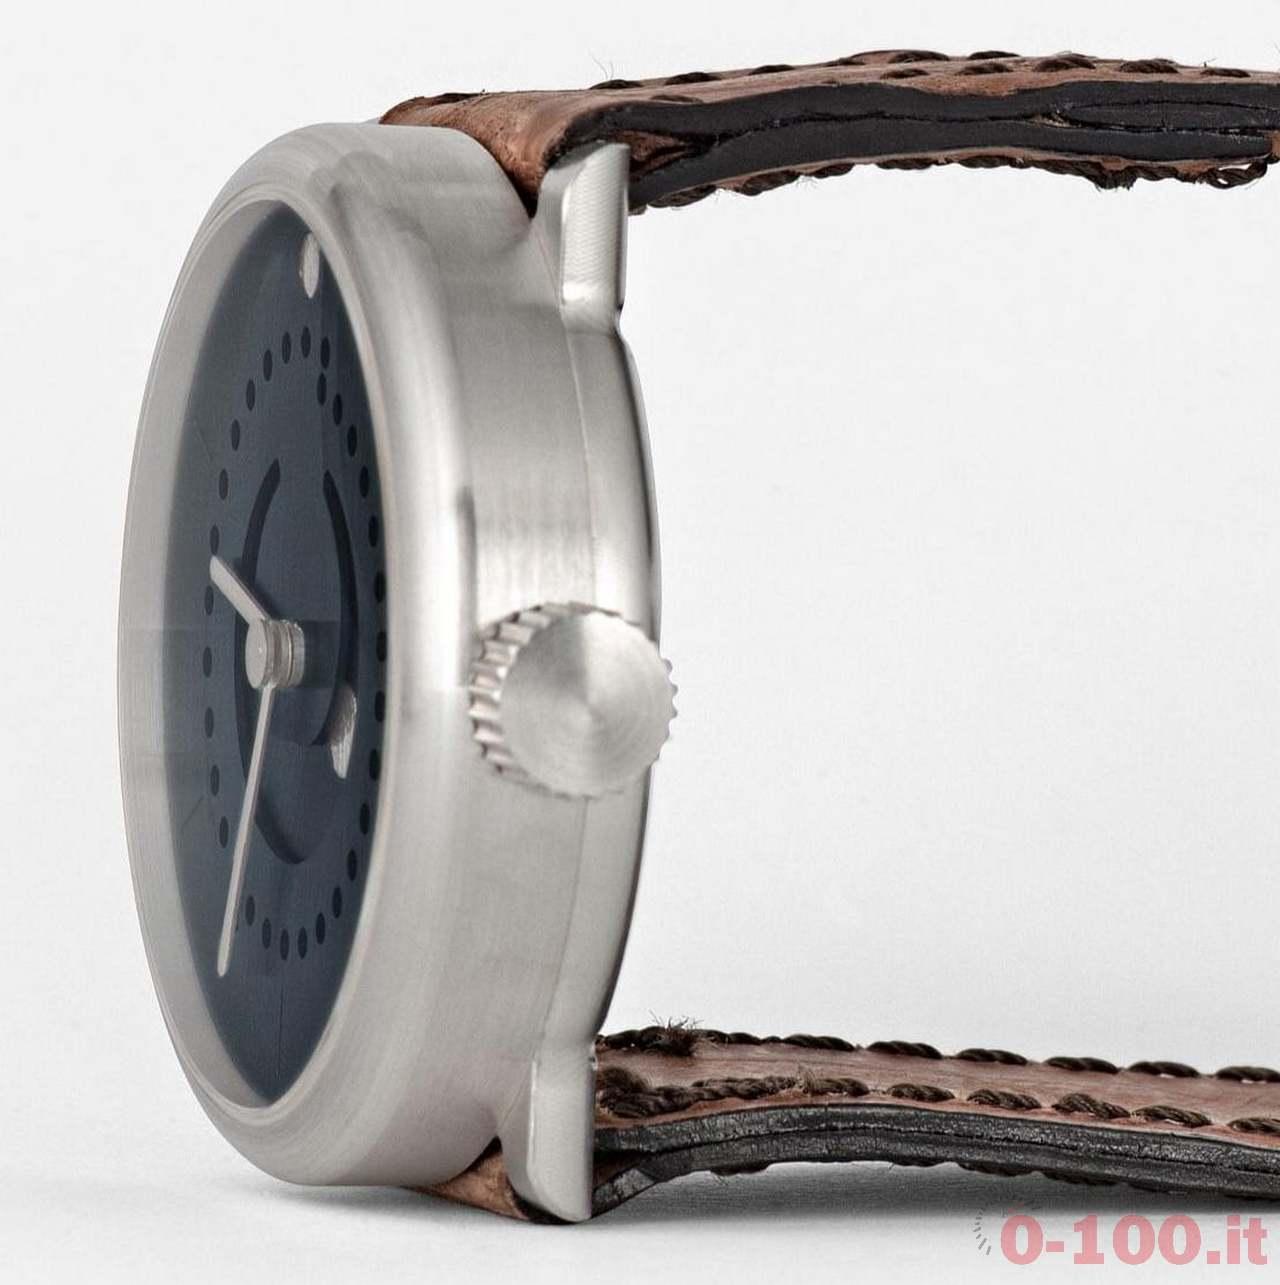 ochs-und-junior-moon-phase-blue-patina-prezzo-price_0-10010